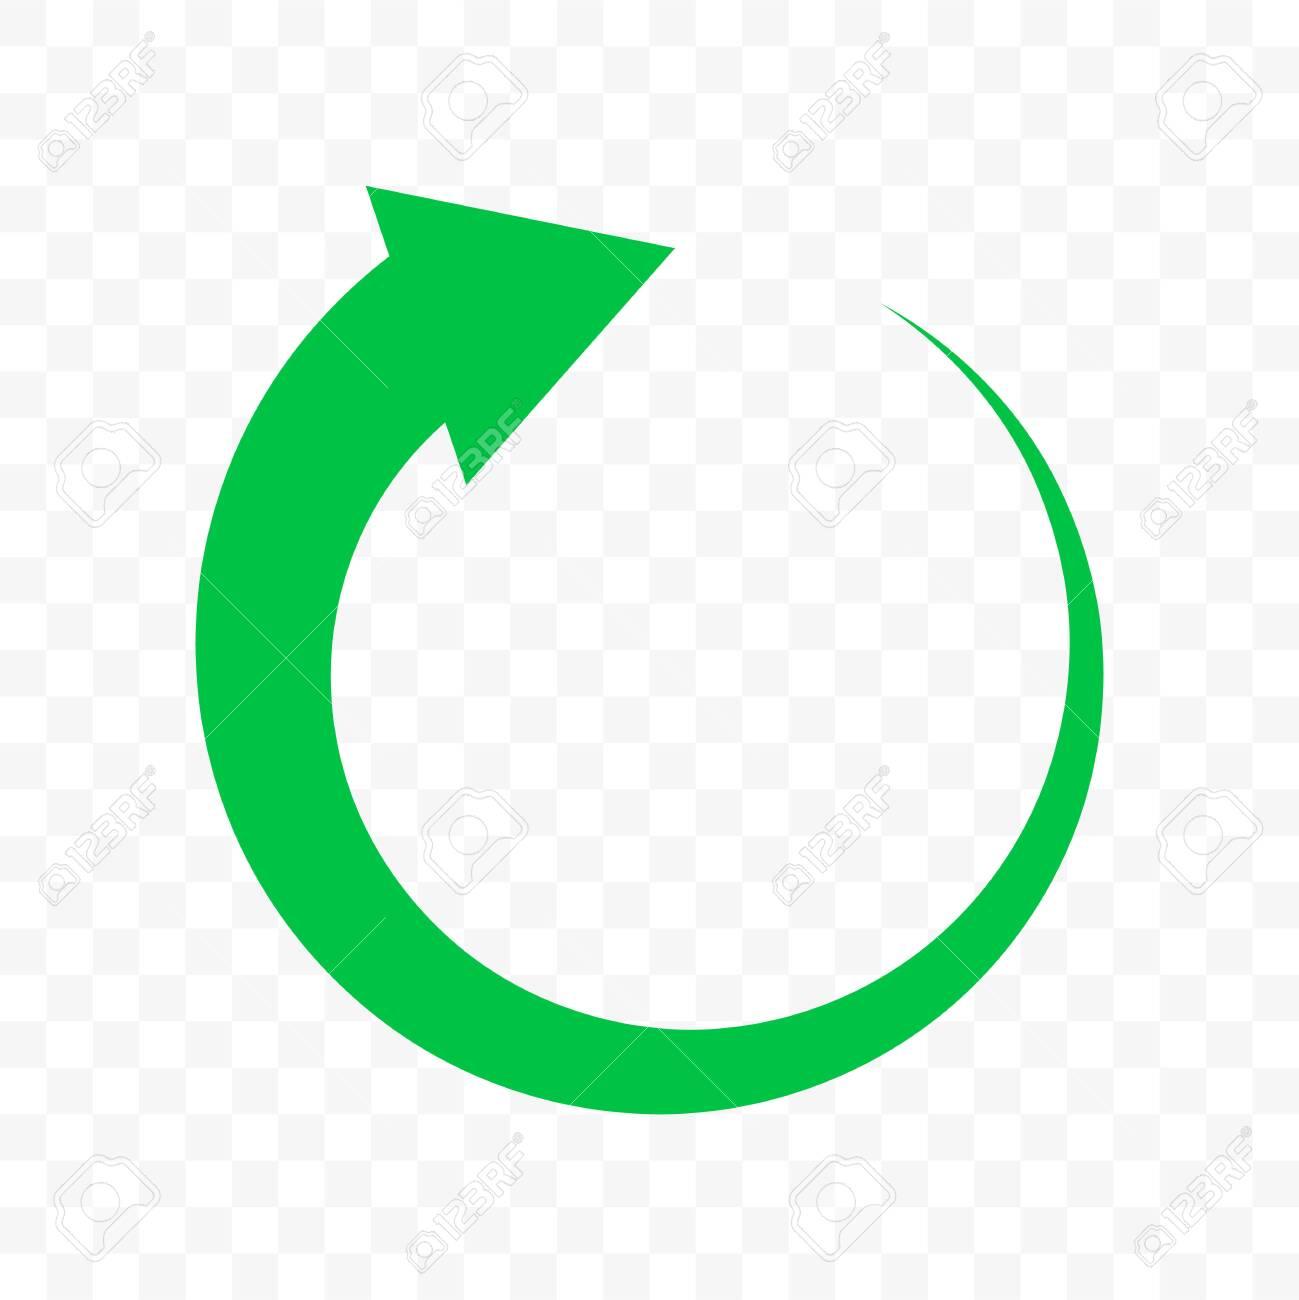 recycle green arrow circle icon vector bio garbage reuse eco royalty free cliparts vectors and stock illustration image 121672242 recycle green arrow circle icon vector bio garbage reuse eco